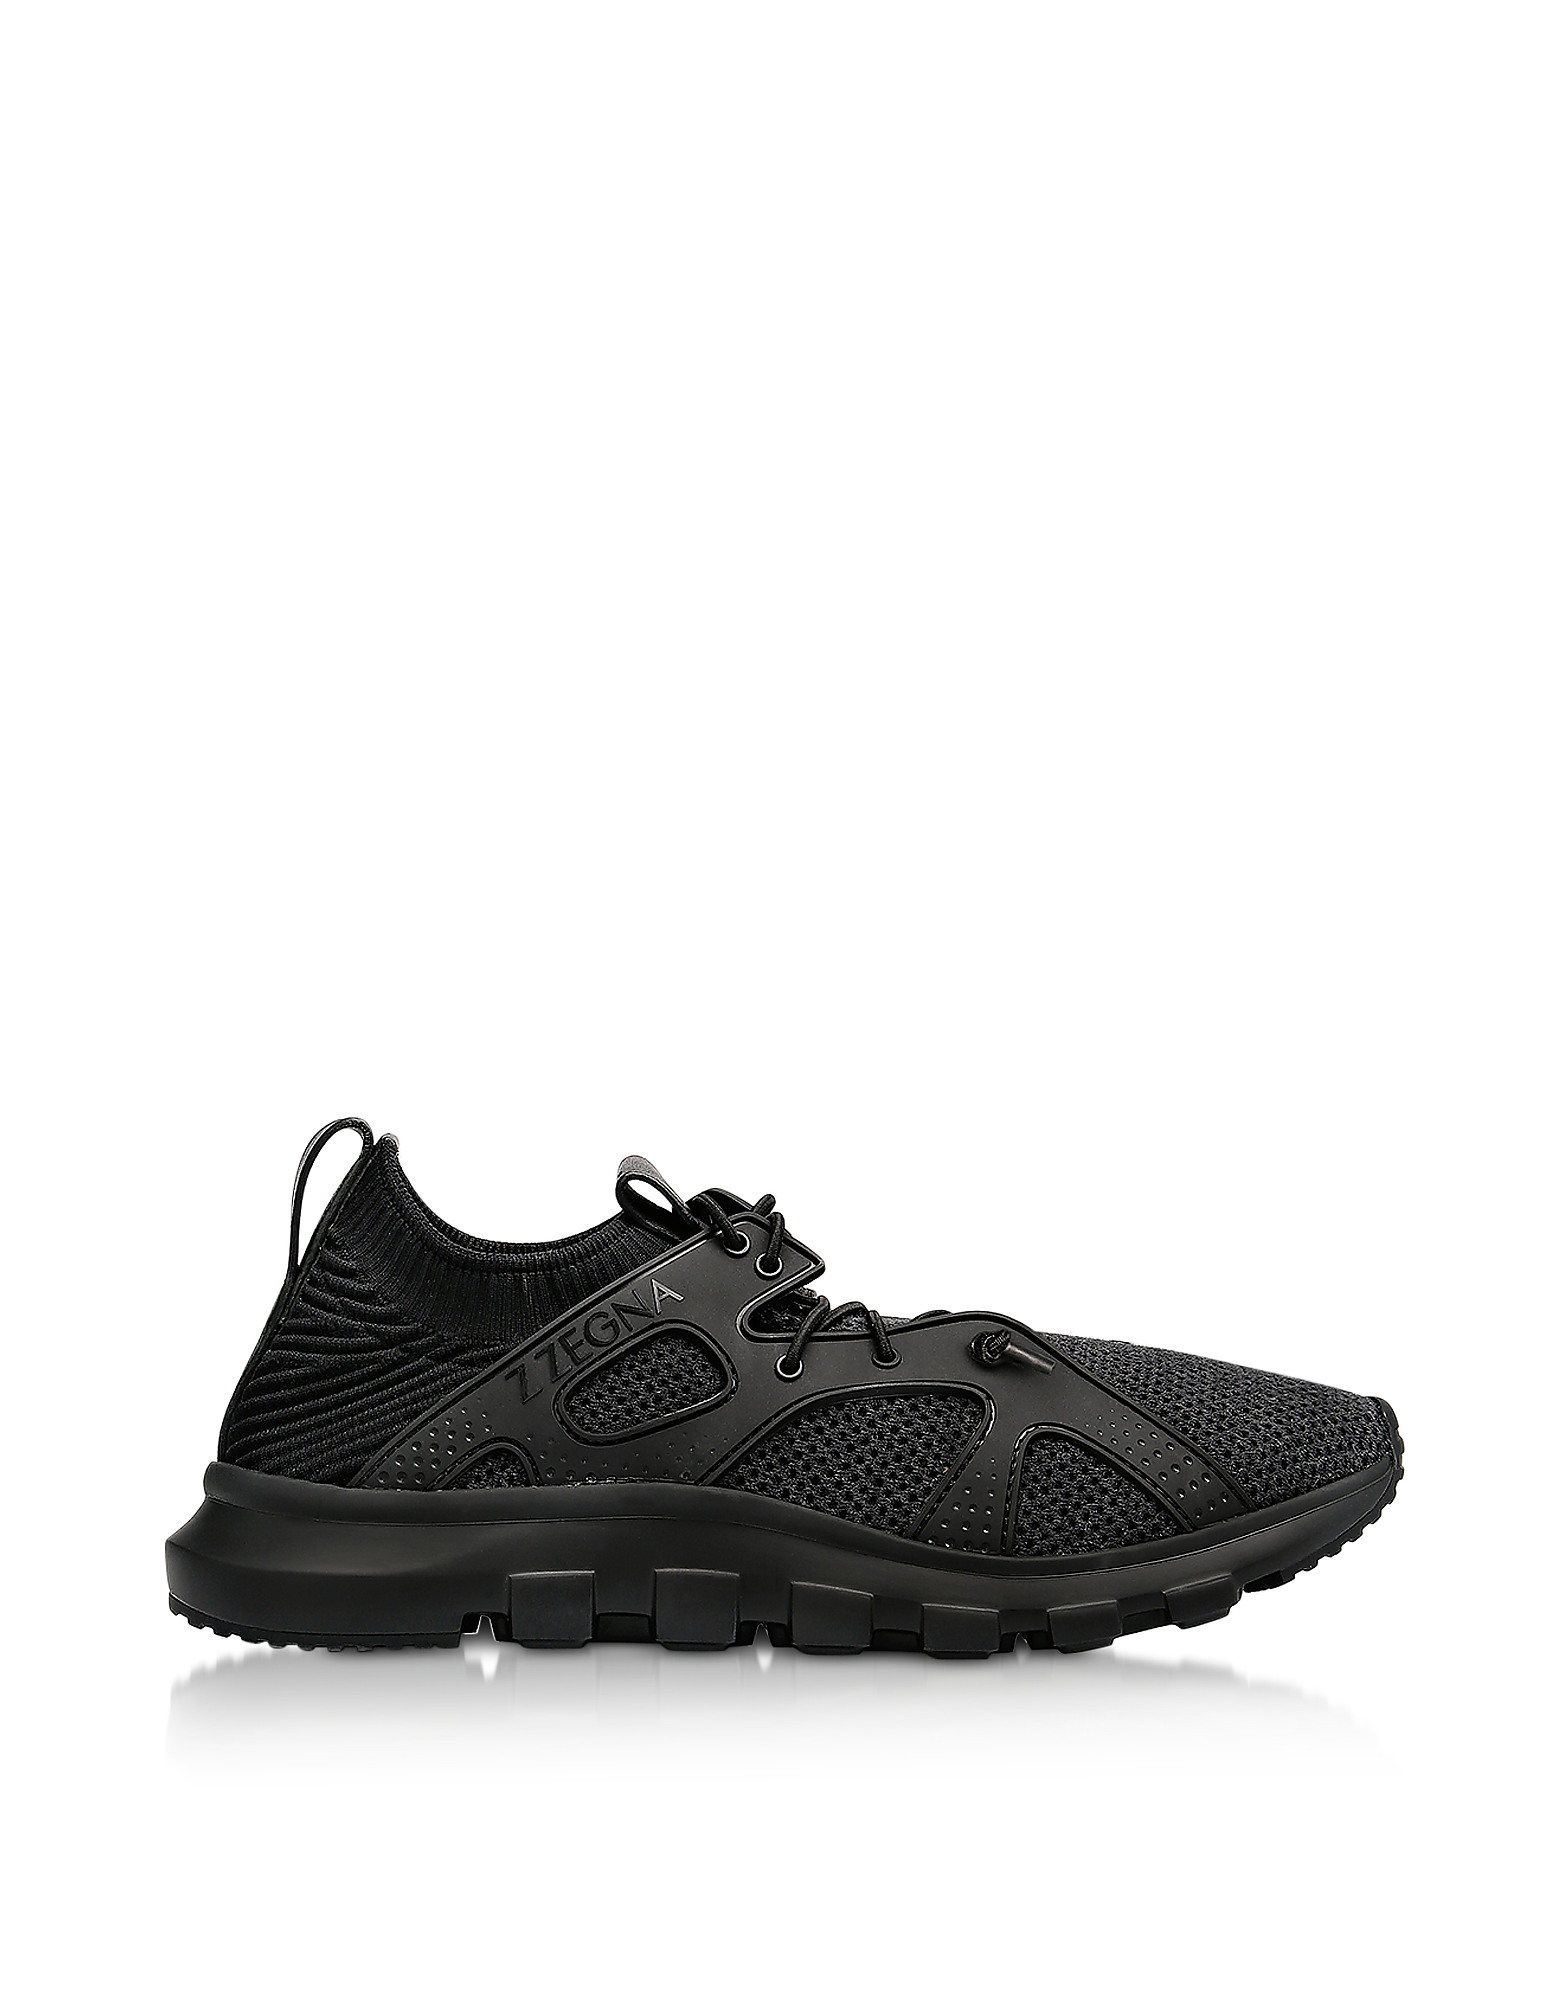 Ermenegildo Zegna Designer Shoes, Black TECHMERINO Sock 2.0 Sneakers